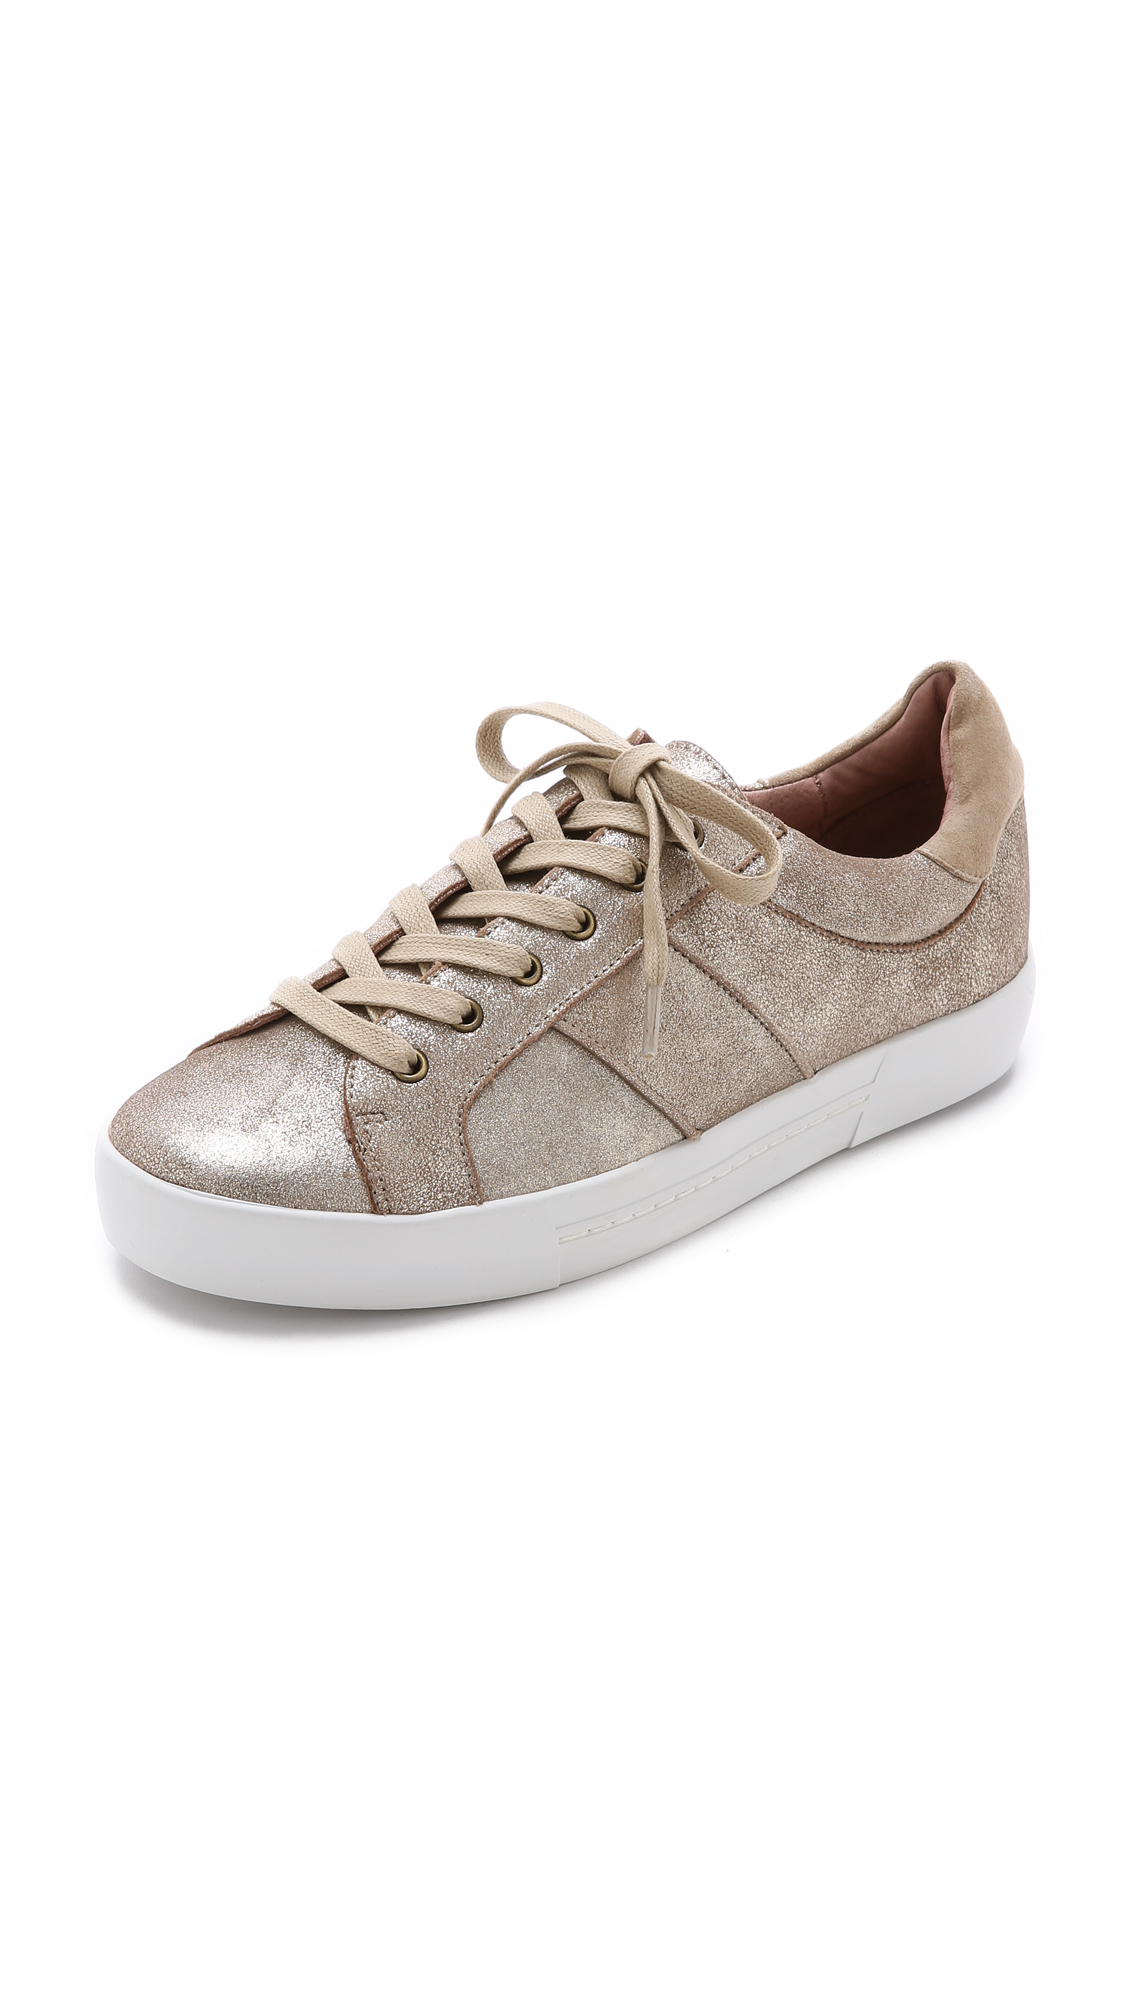 Joie Leather Dakota Sneakers in Metallic